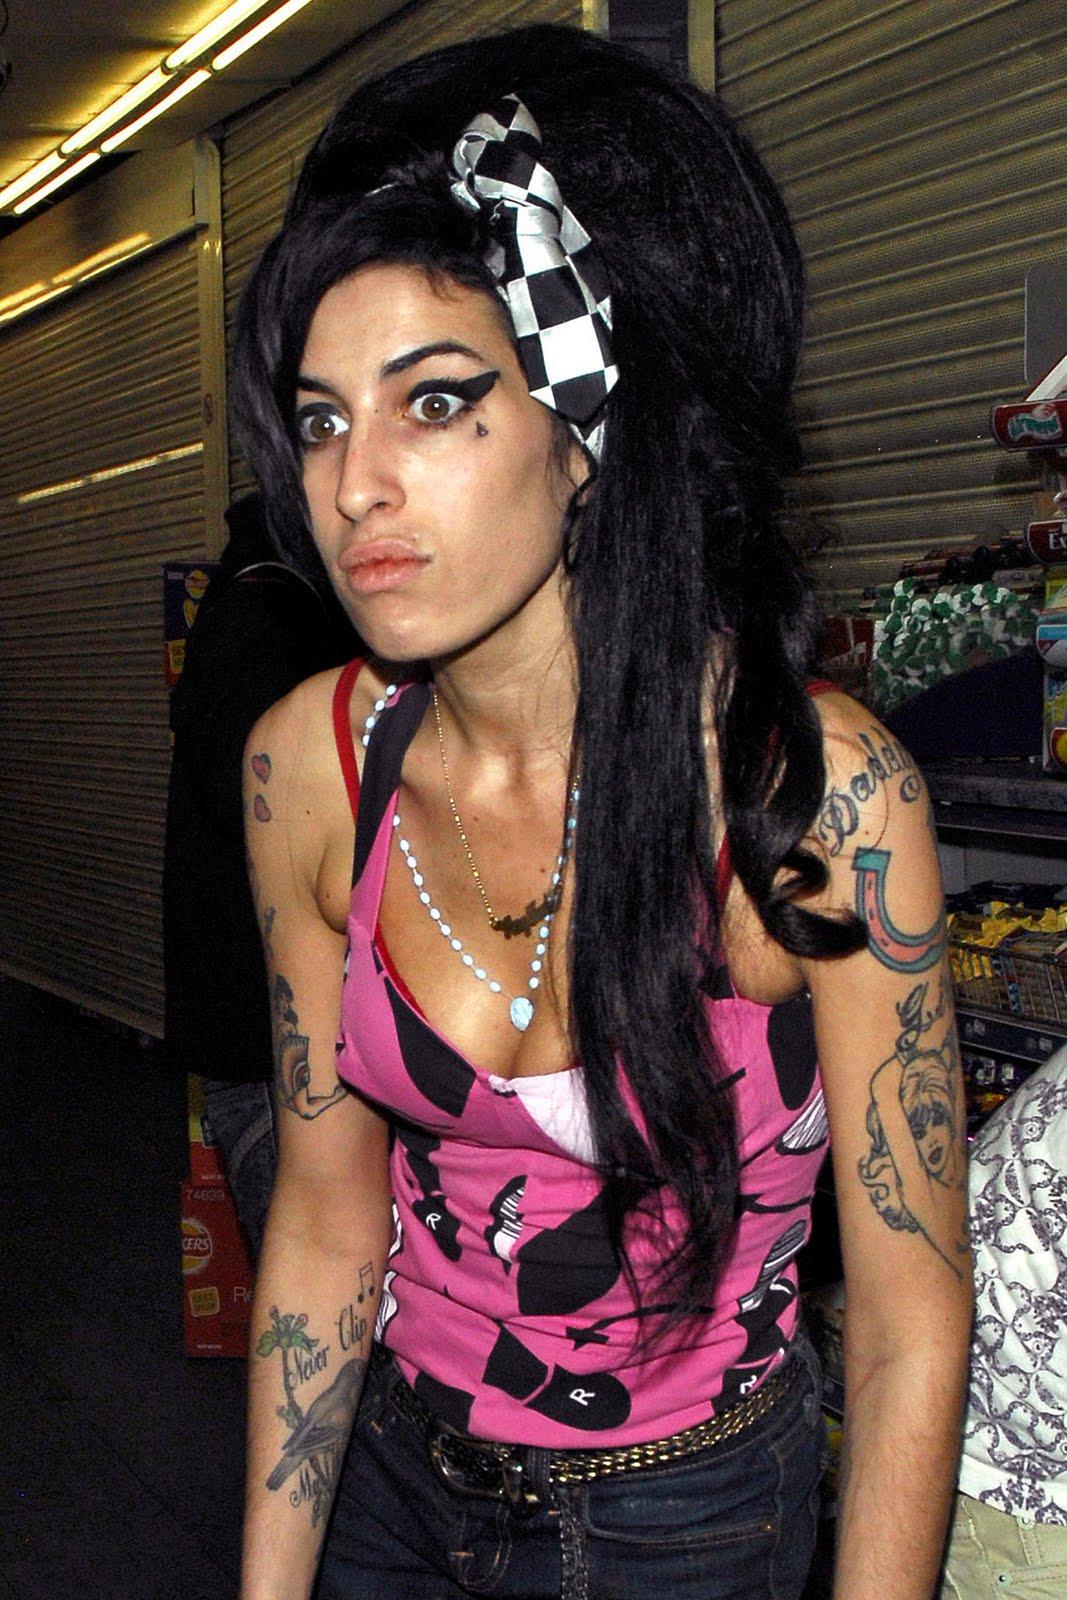 http://3.bp.blogspot.com/_csogD6ptEnI/SwD5iAHcA6I/AAAAAAAADhc/Bqx4S0Ov79A/s1600/Amy_Winehouse_03.jpg